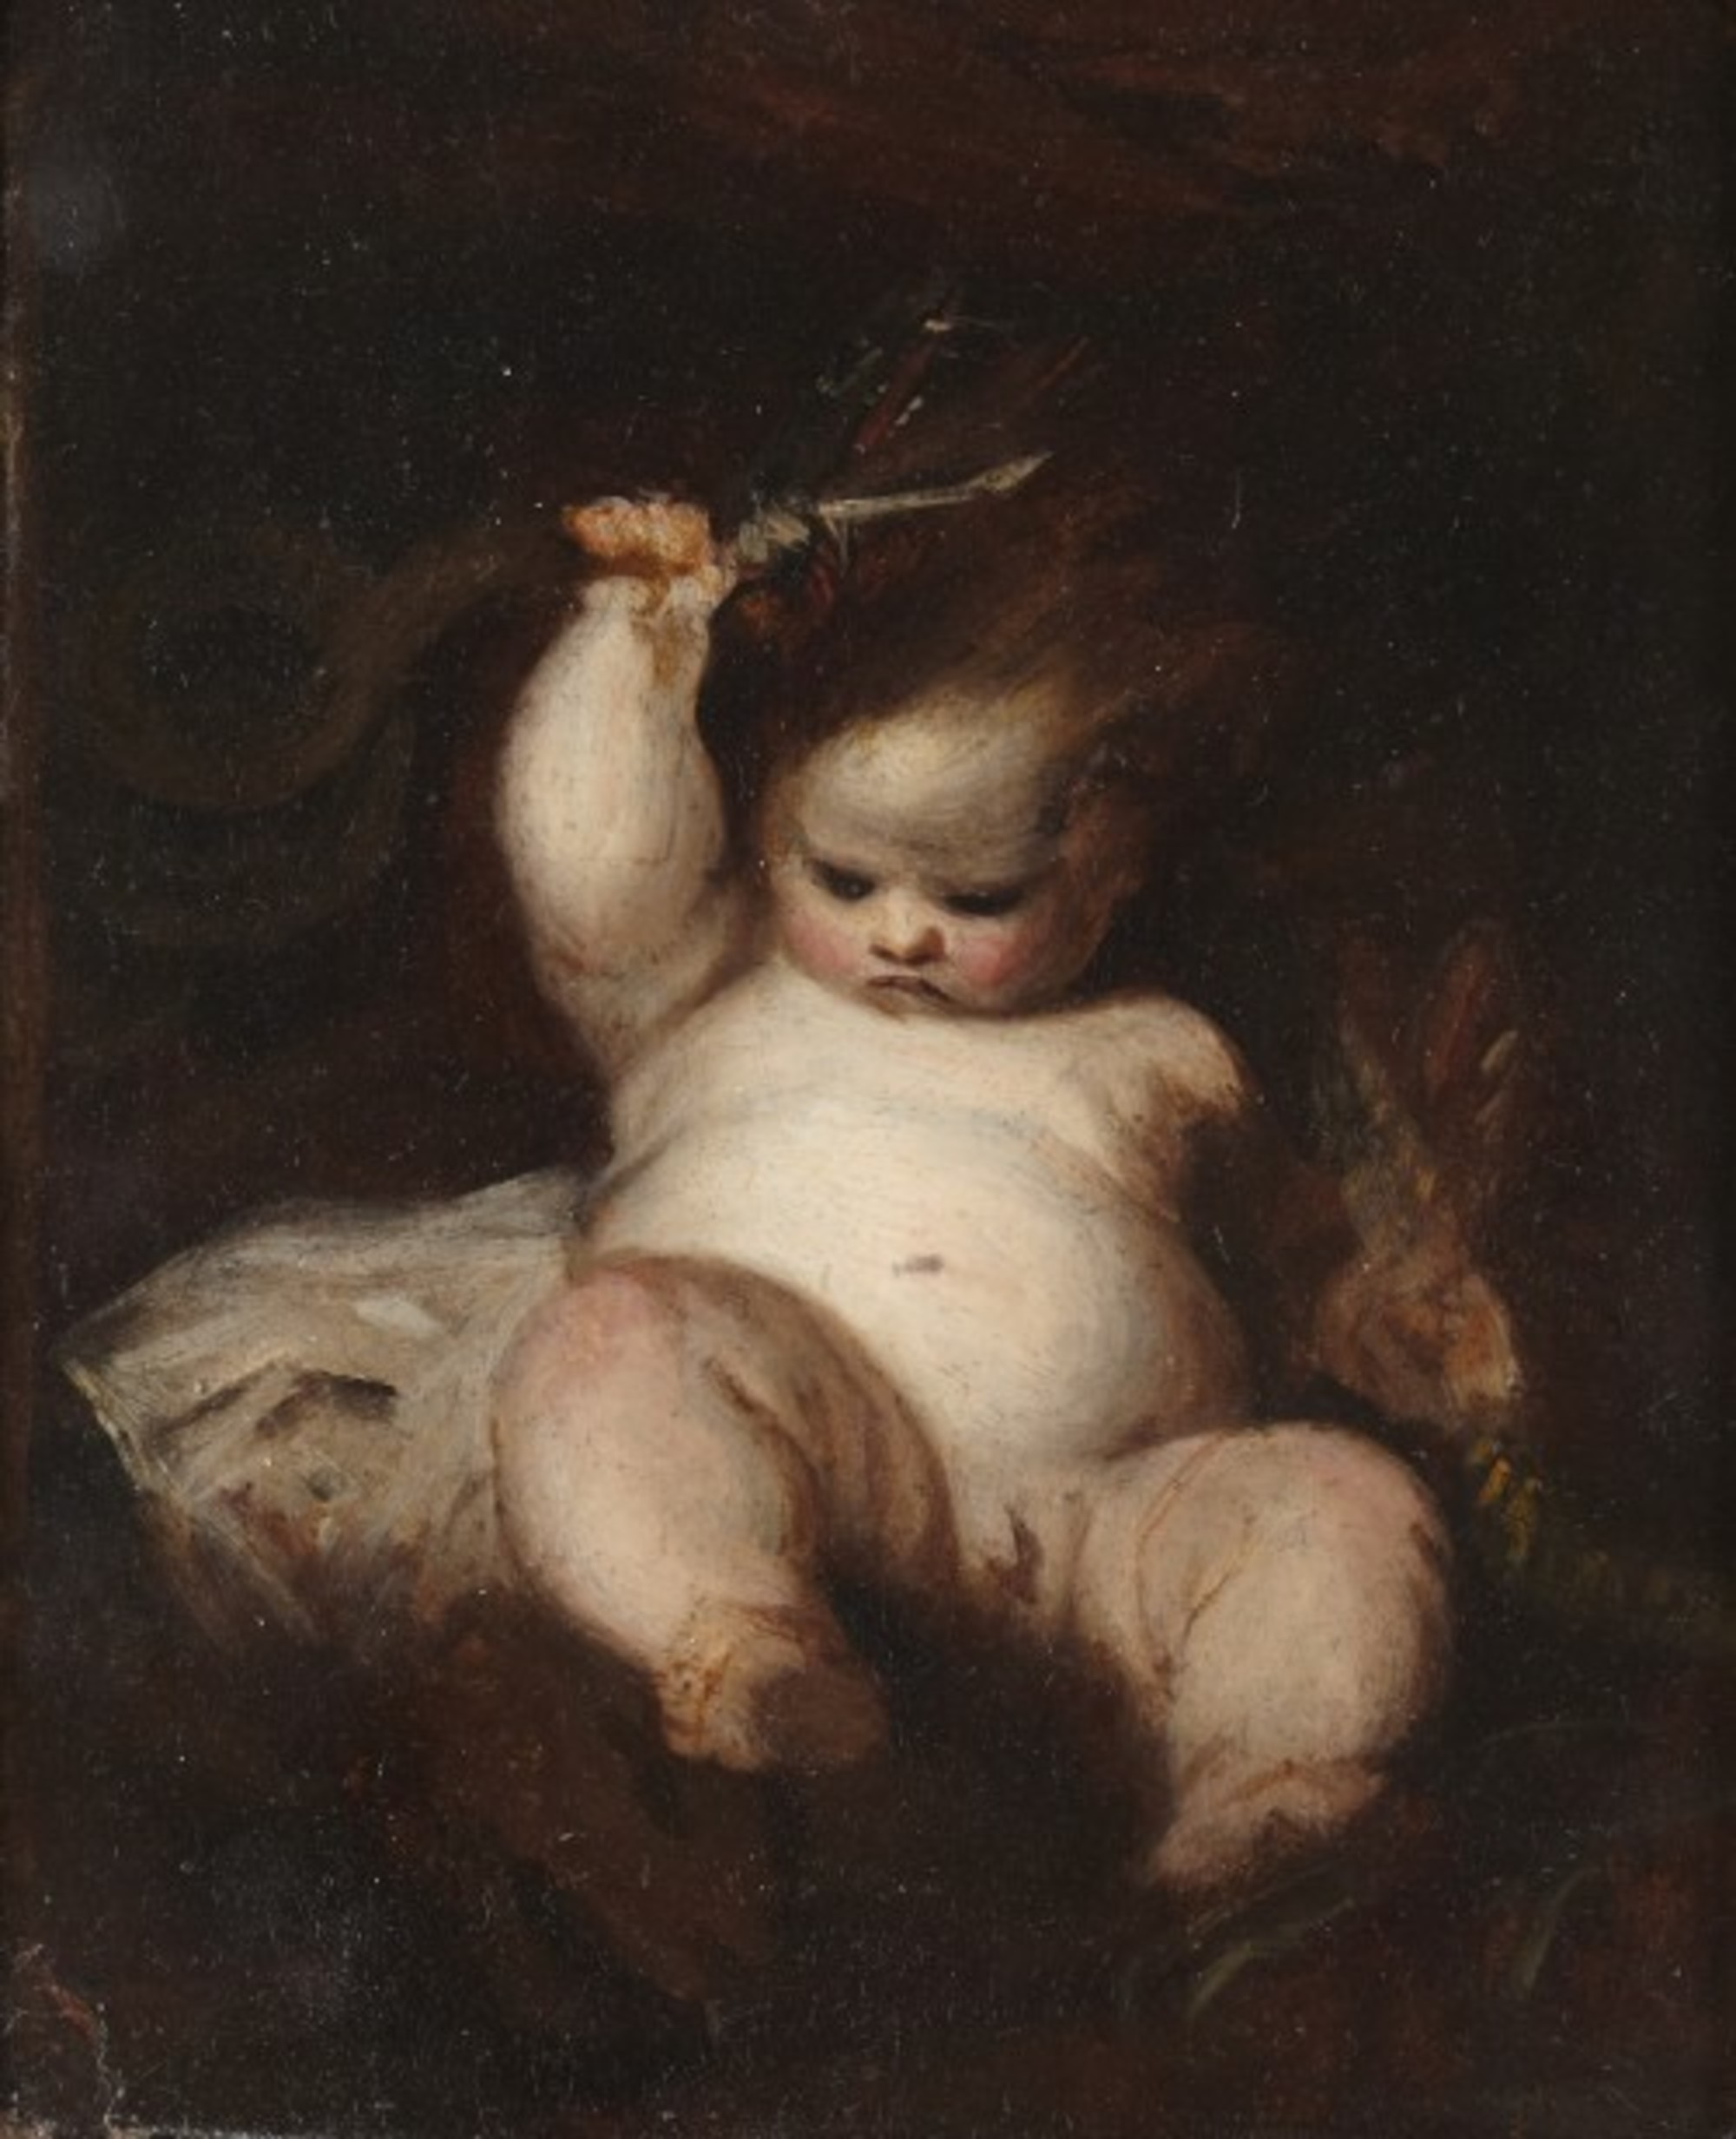 Reynolds_Sir_Joshua_The_Infant_Hercules_ca._1785-89.jpg